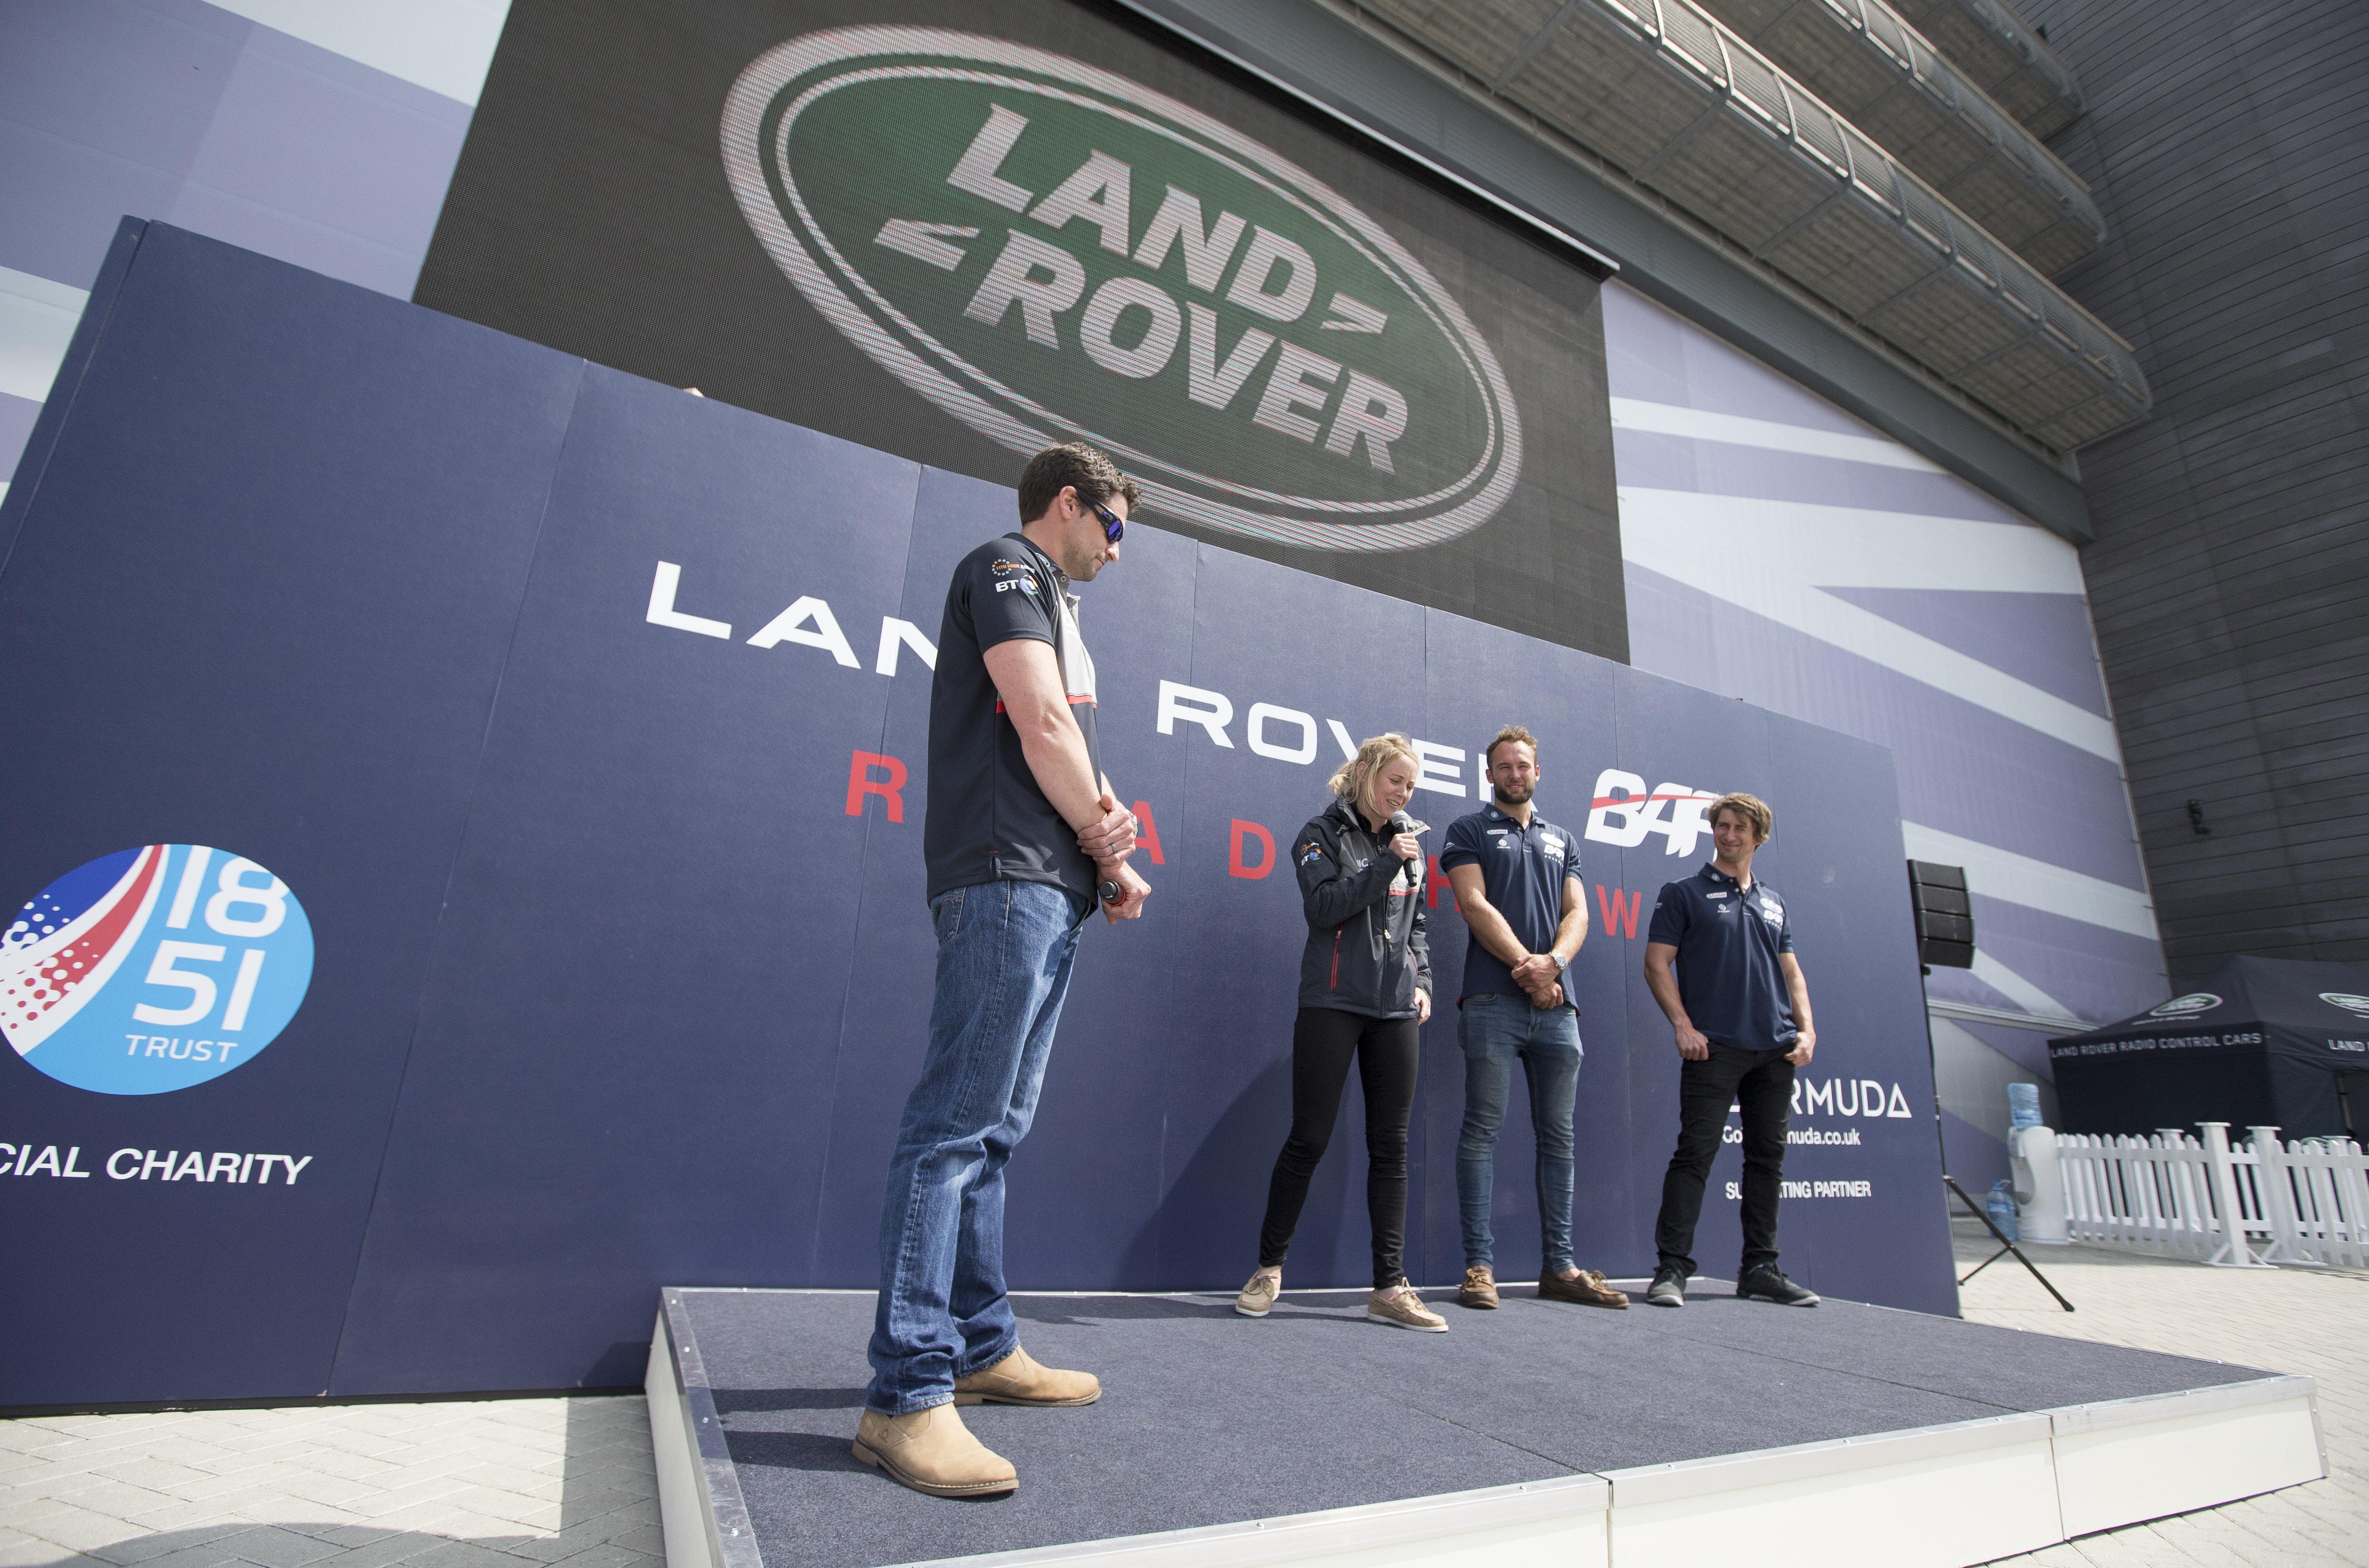 Land Rover BAR Roadshow 2017